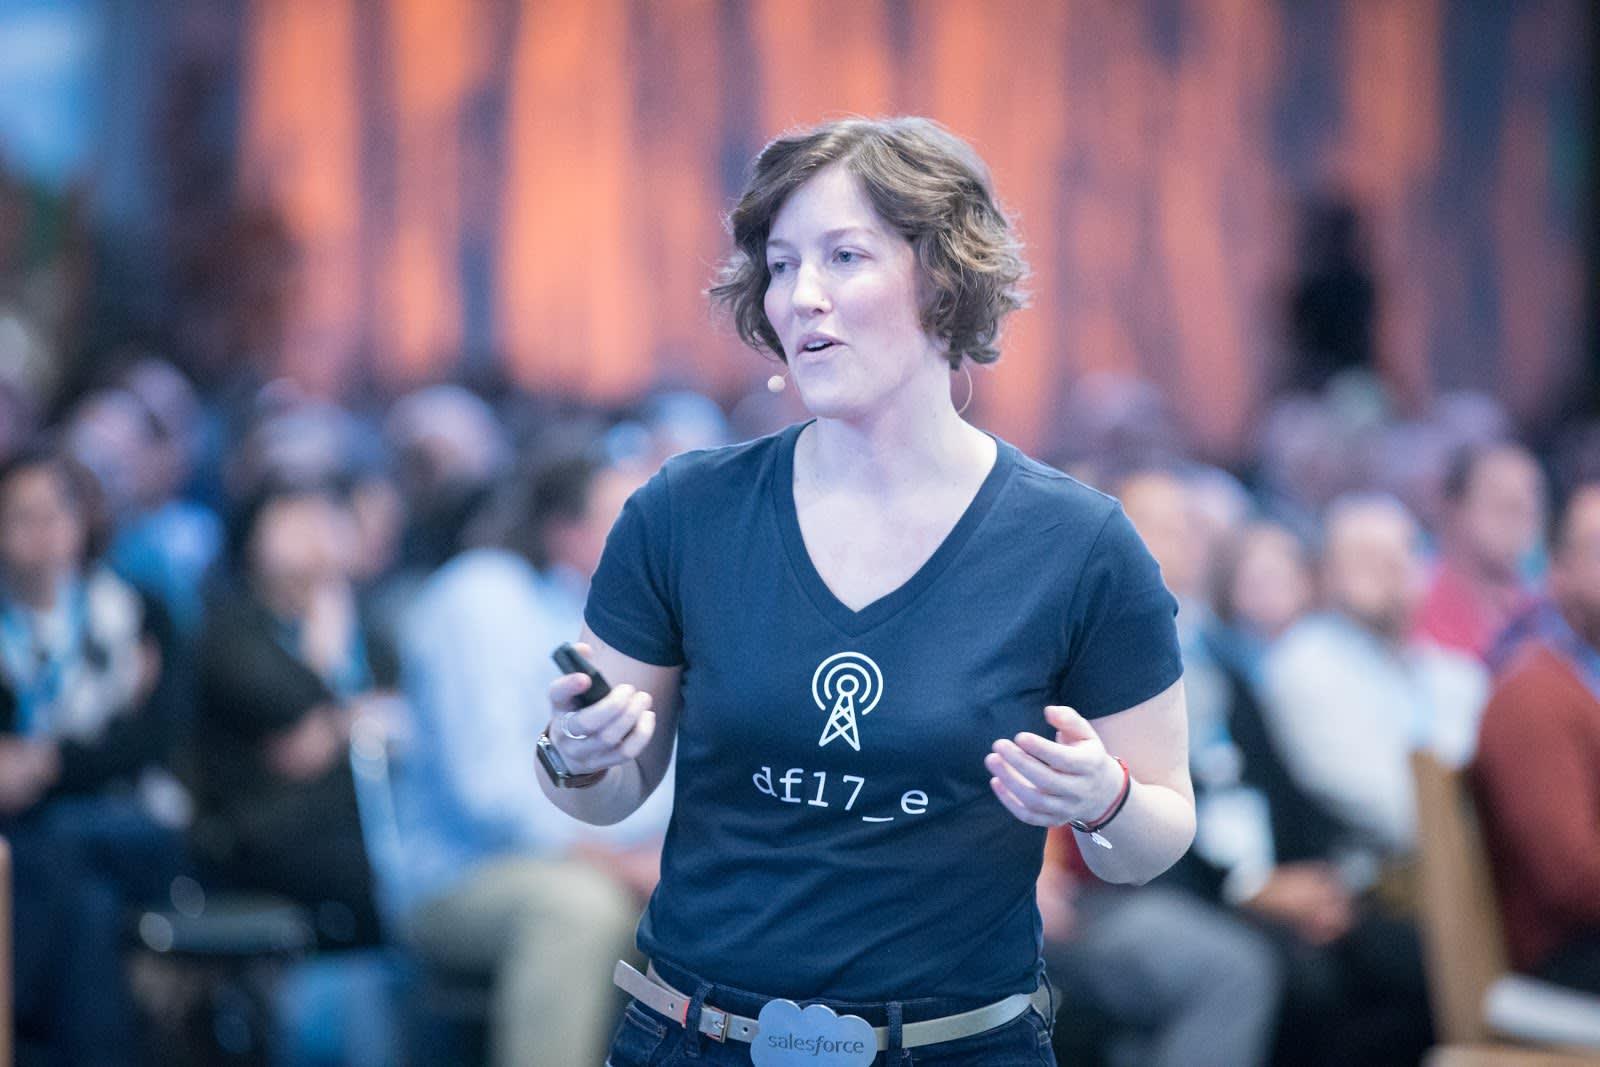 Zayne Turner presenting during the Developer keynote.